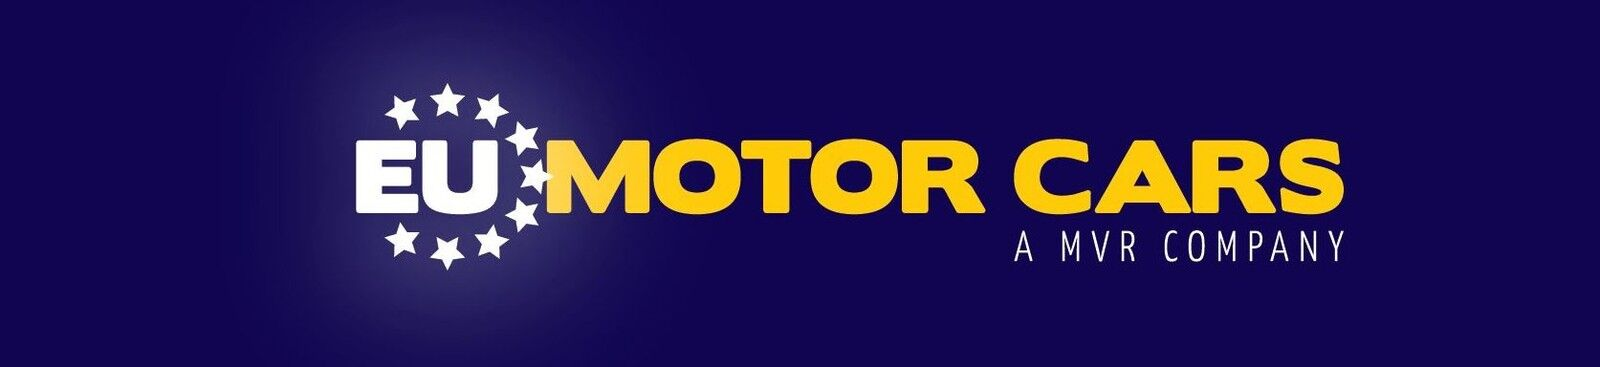 EU Motor Cars International